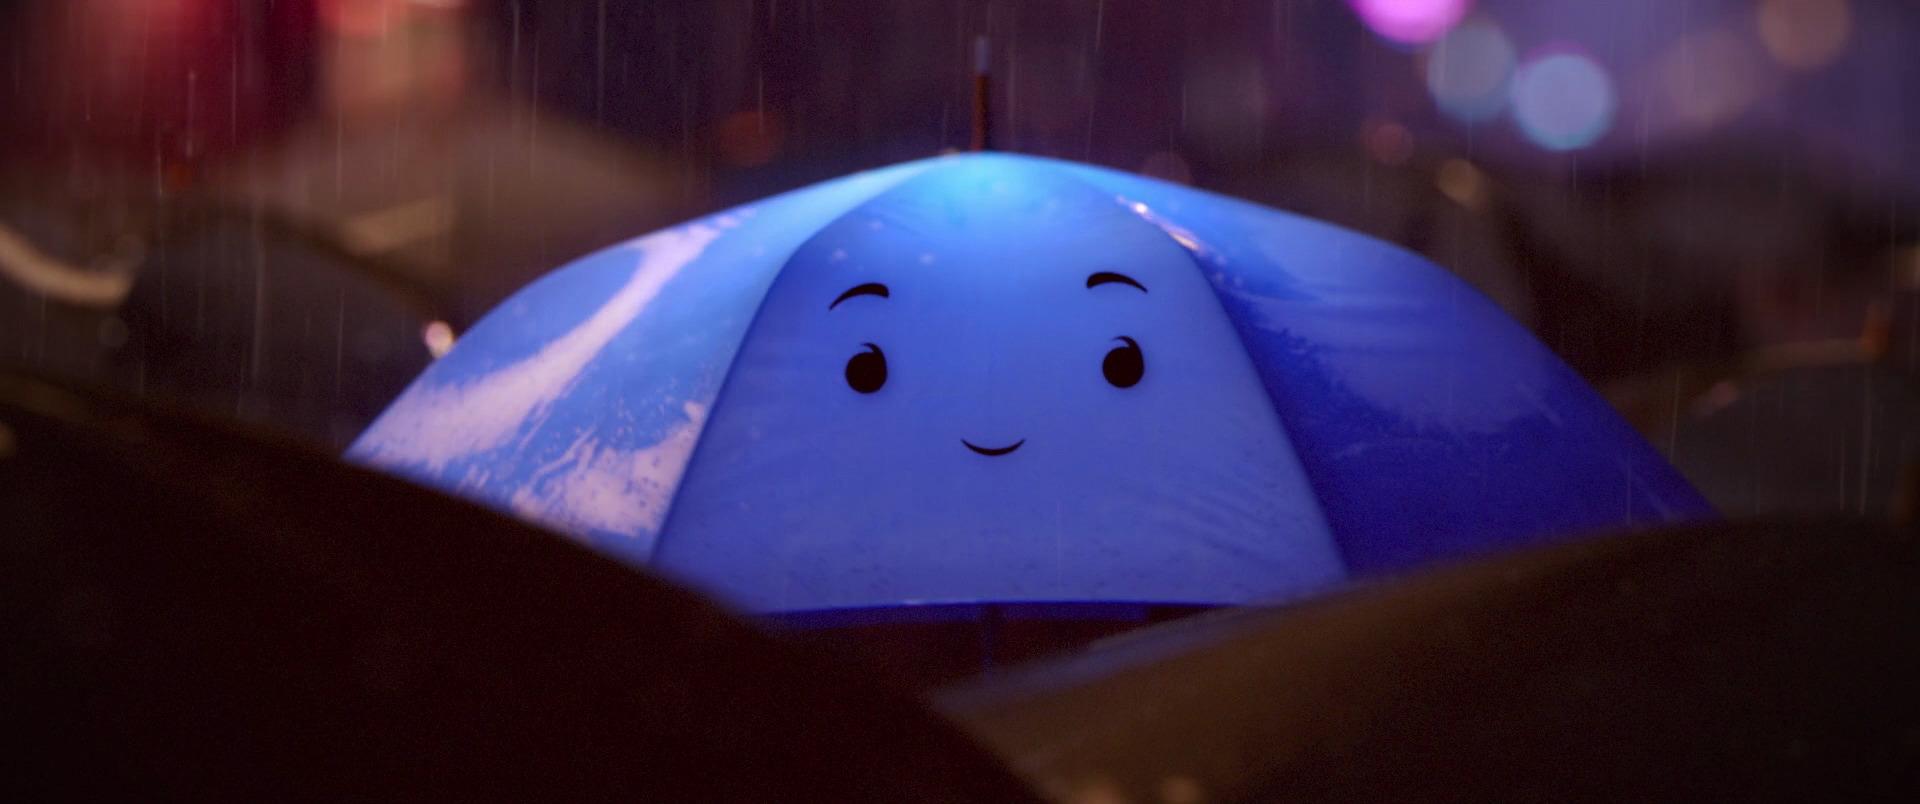 personnage character pixar disney parapluie bleu blue umbrella